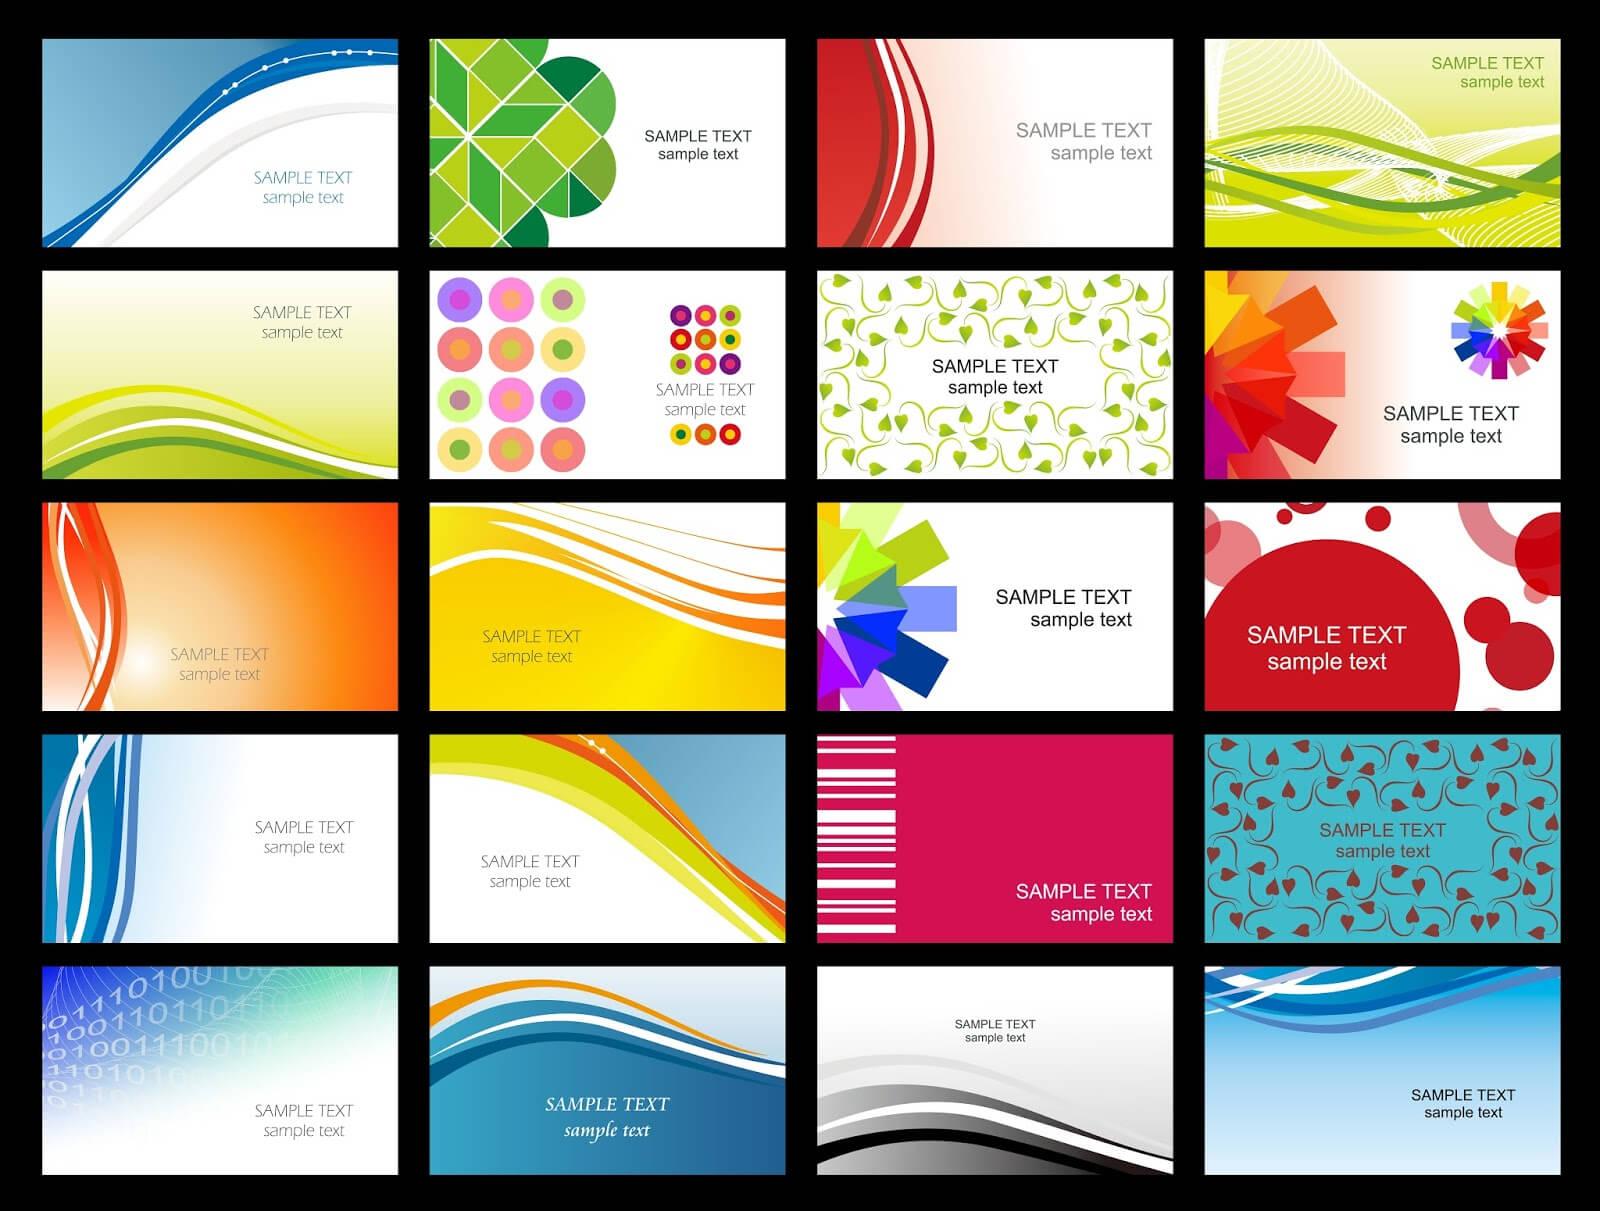 Printable Business Card Template – Business Card Tips Regarding Business Card Template For Google Docs